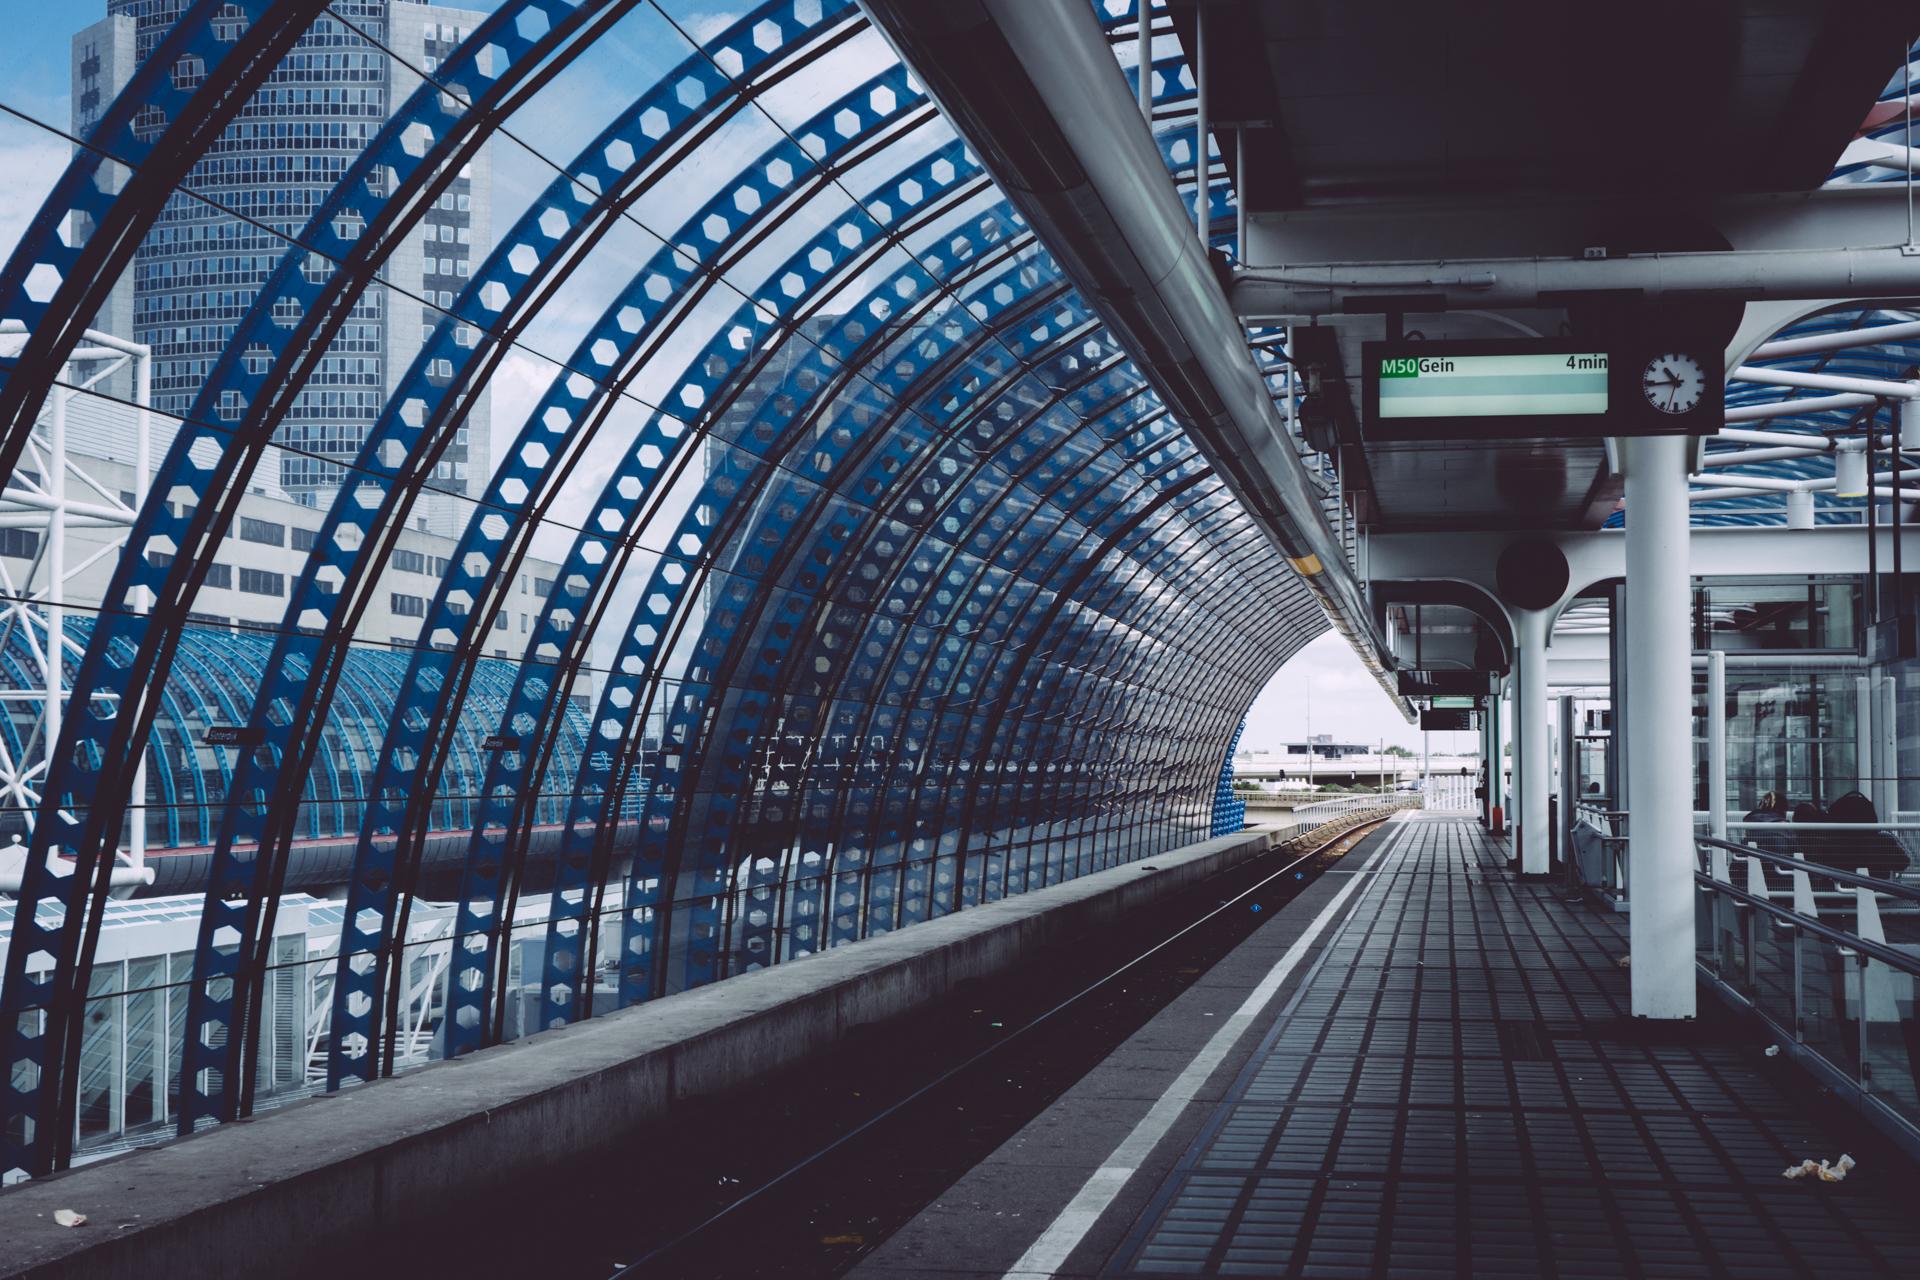 La gare Amsterdam – Sloterdijk